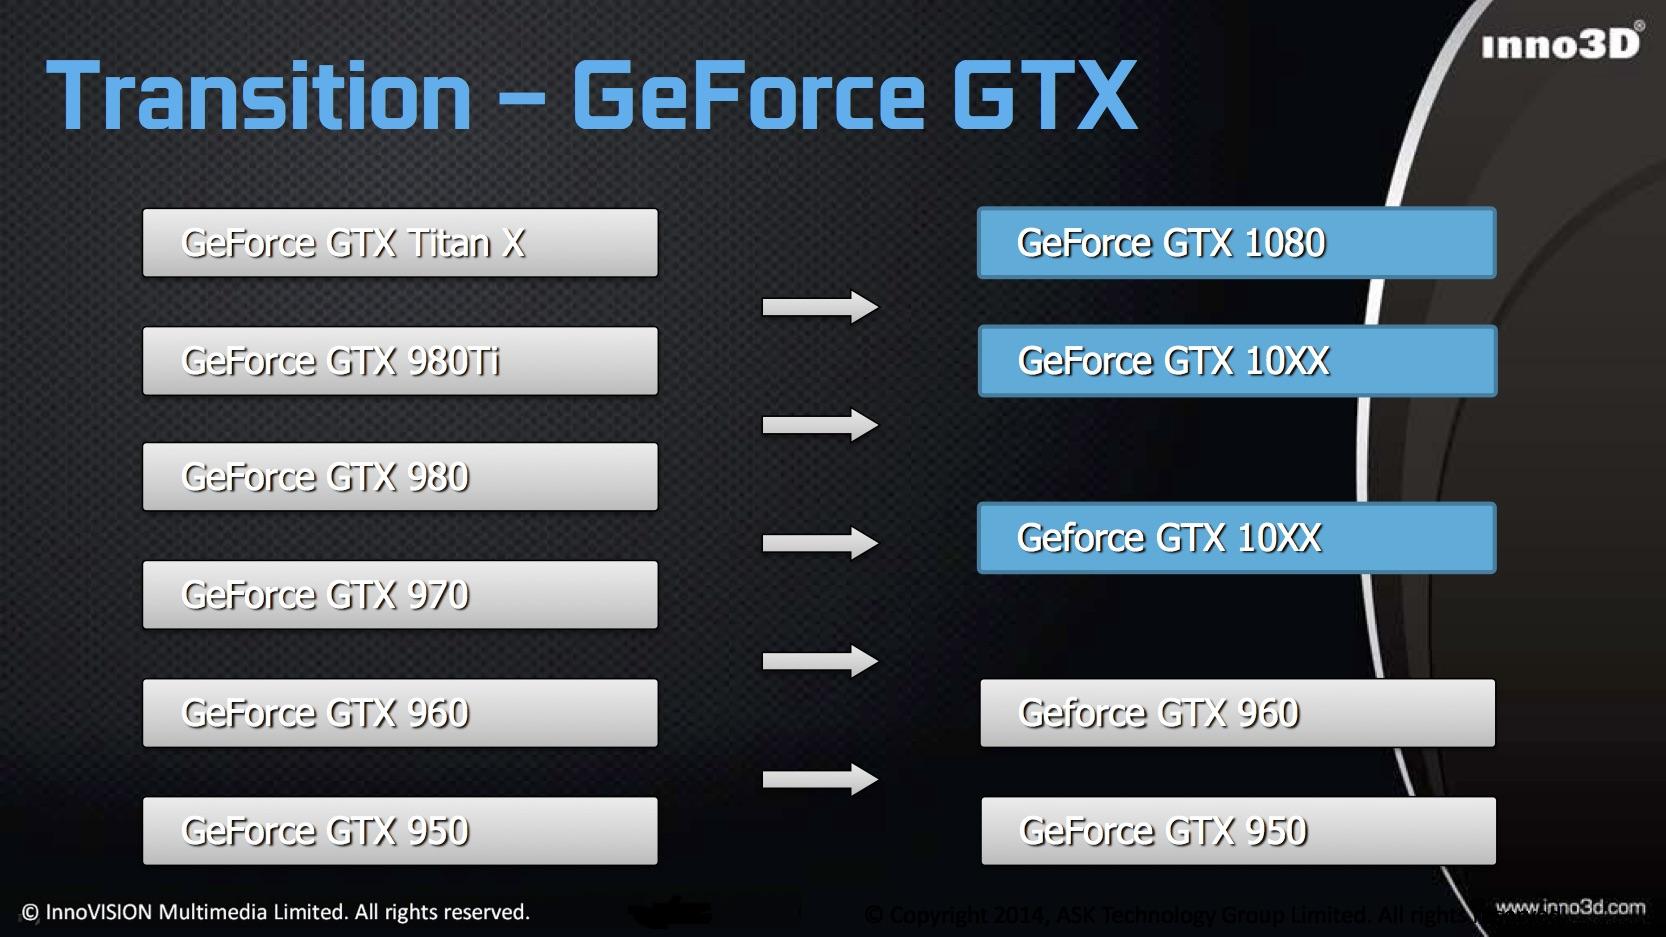 Inno3D Confirms NVIDIA Pascal Based GeForce GTX 1060 / Ti